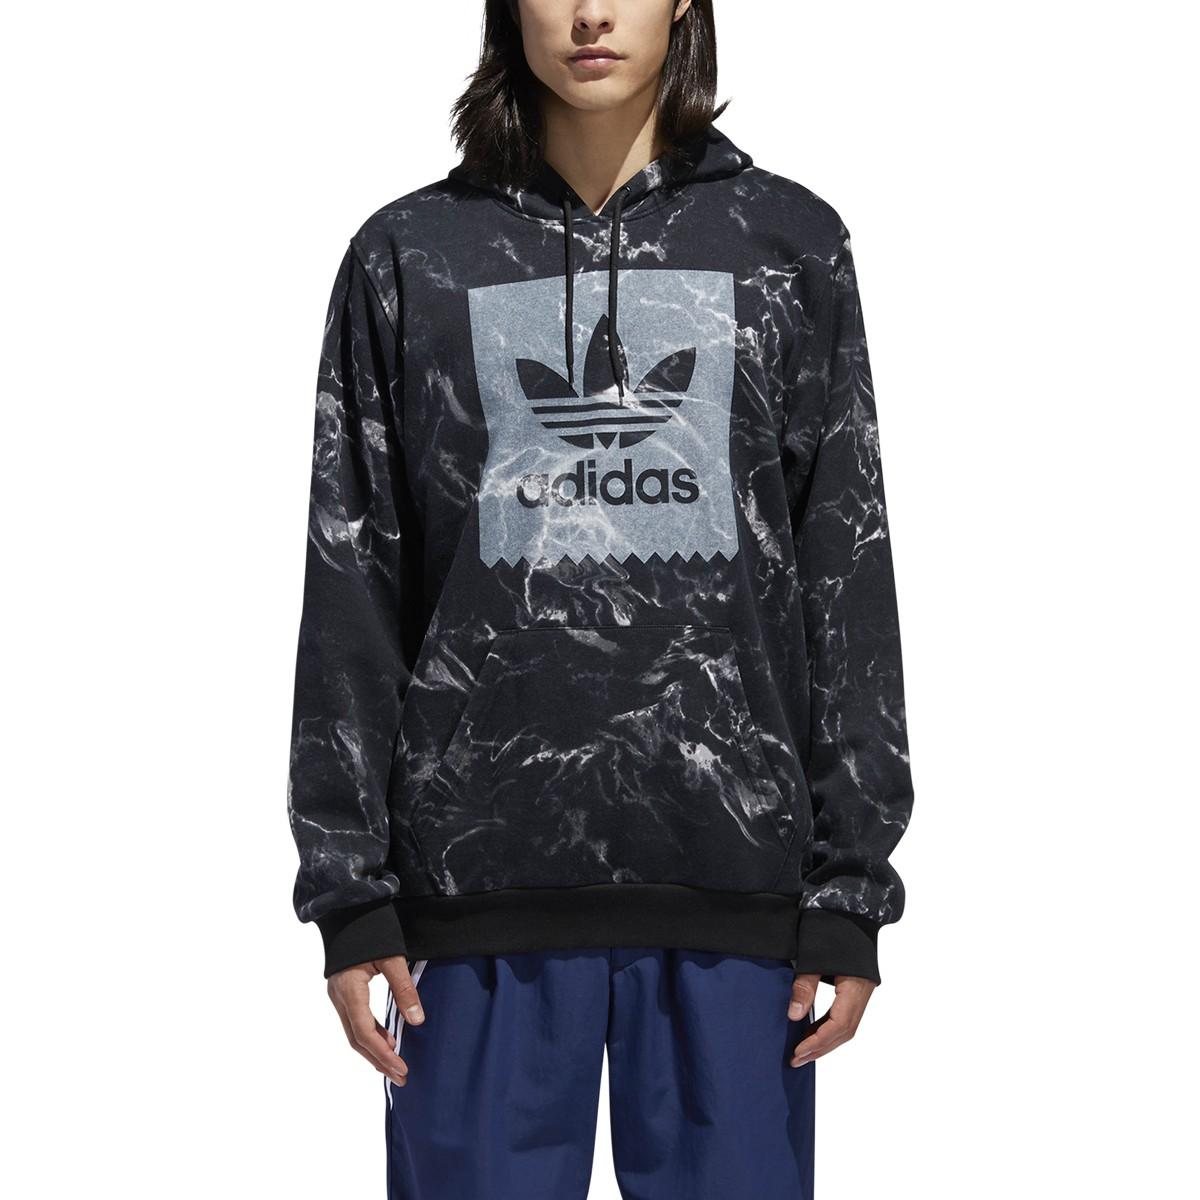 Adidas Men S Other Sports Marble Print Hoodie Black White Dh3922 Ebay